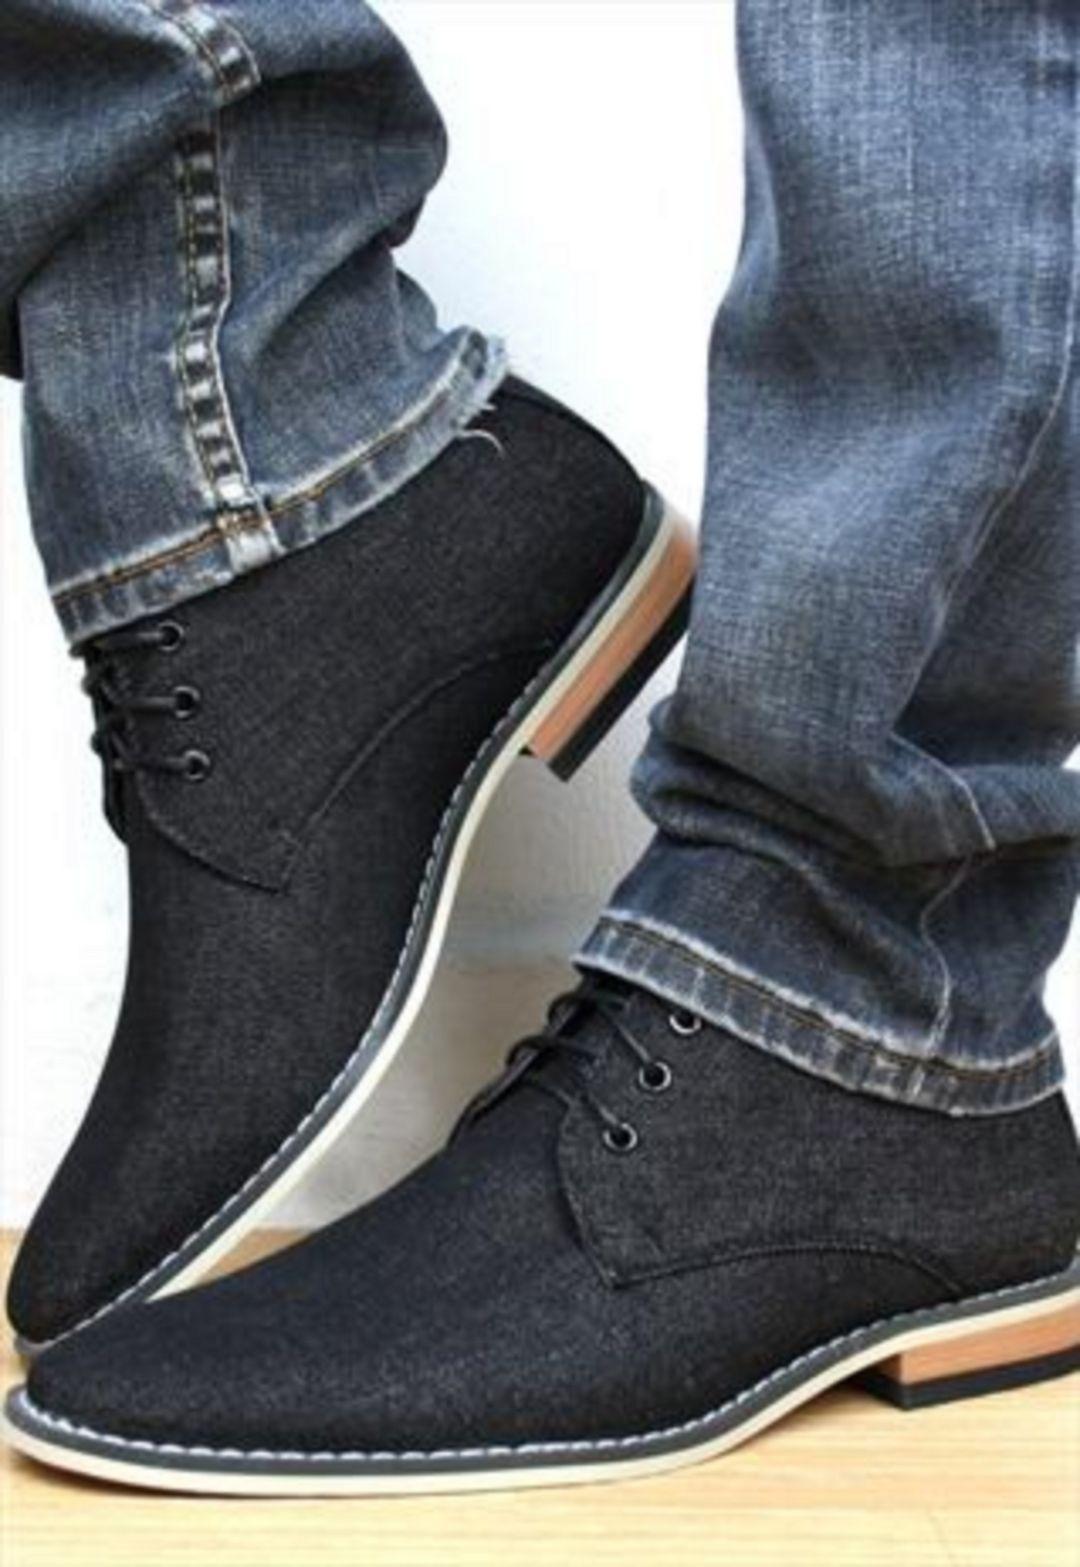 15 Best Men S Shoes Trend That Can Make You Cooler Dress Shoes Men Mens Desert Boots Dress Shoes [ 1567 x 1080 Pixel ]